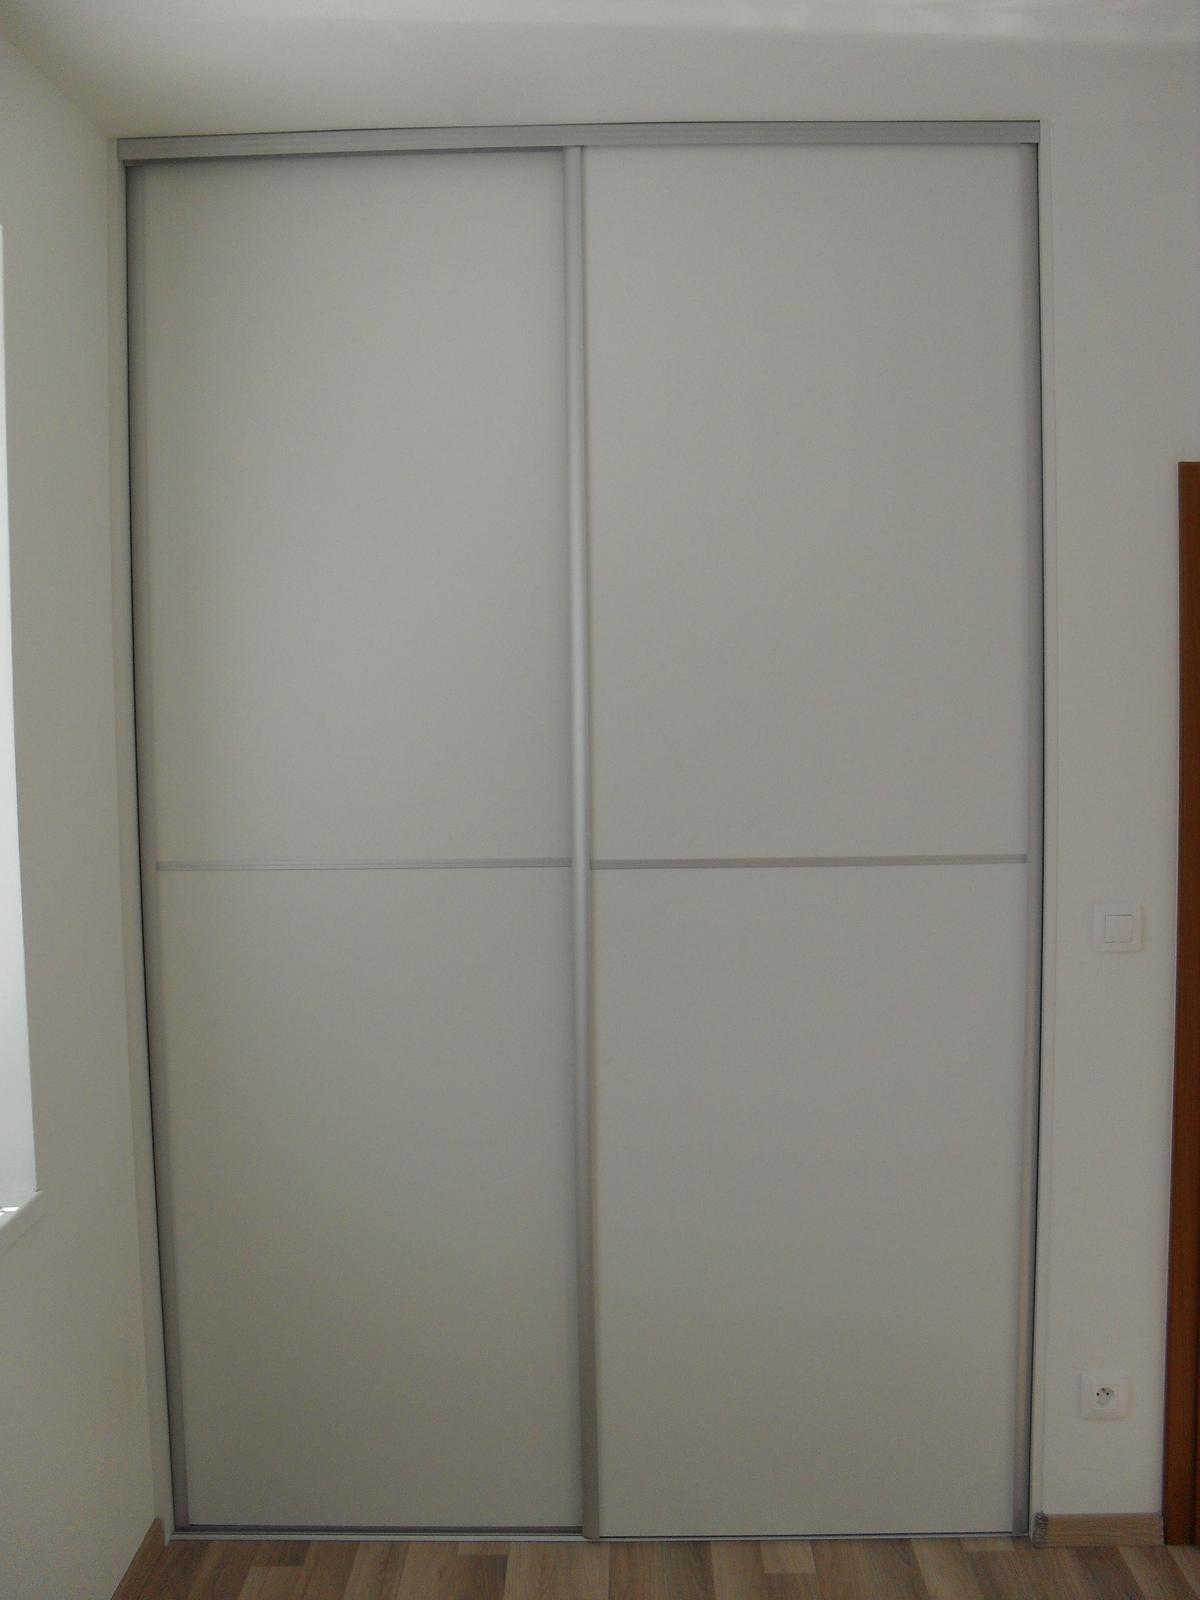 Vstavané skrine Martin Benko Bošany - Obrázok č. 14